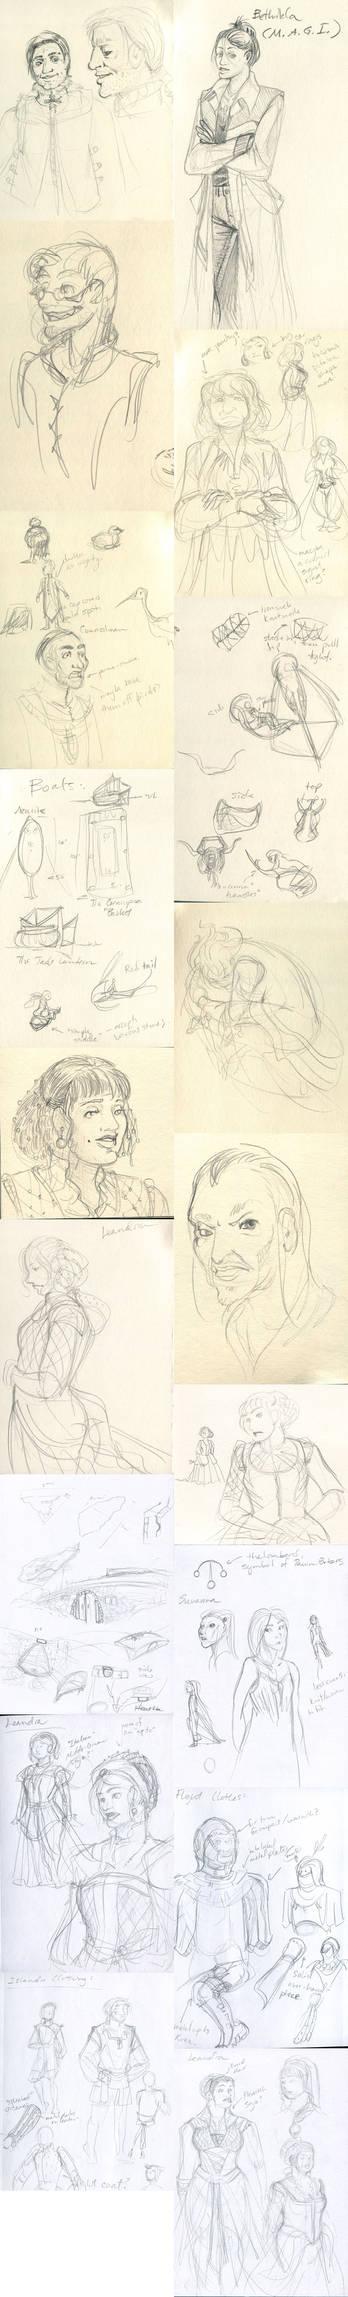 Sketch Dump 2012 No 3